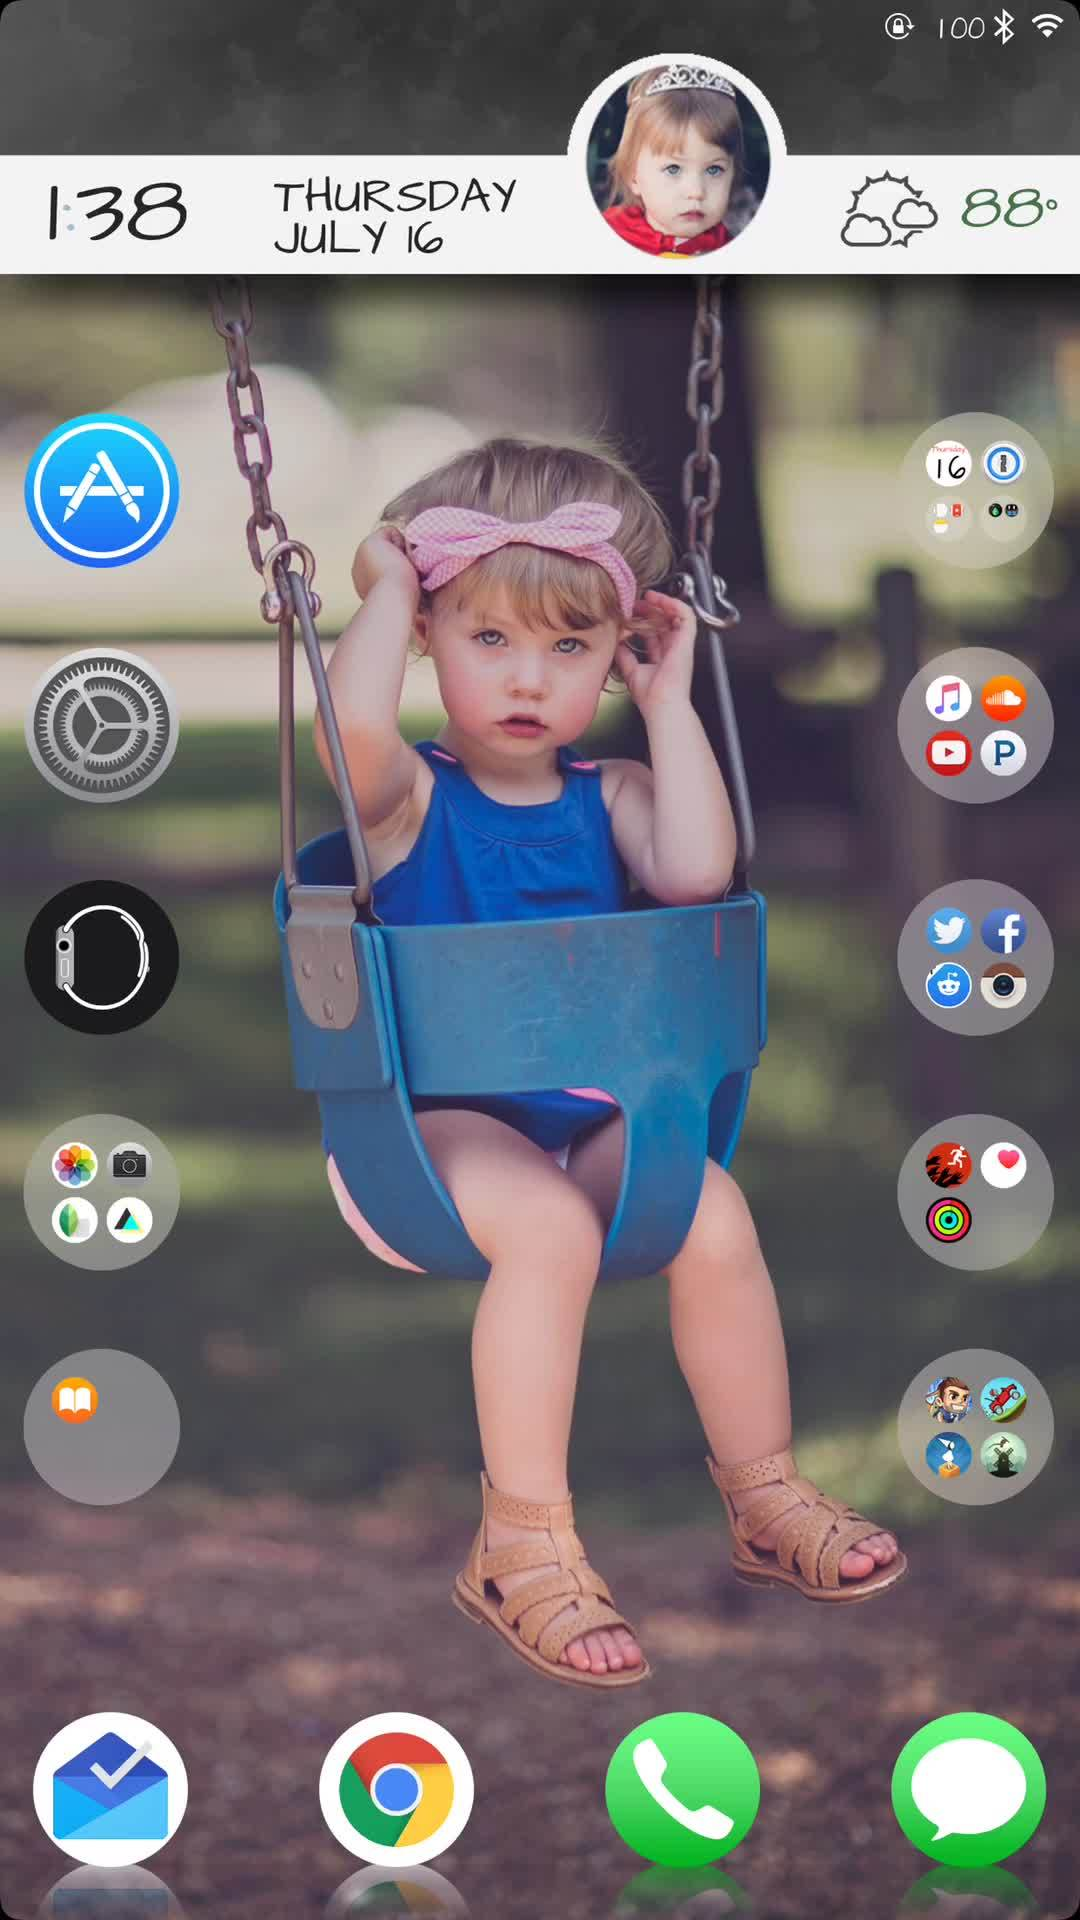 iosthemes, jailbreak, iWidget GIF Test GIFs